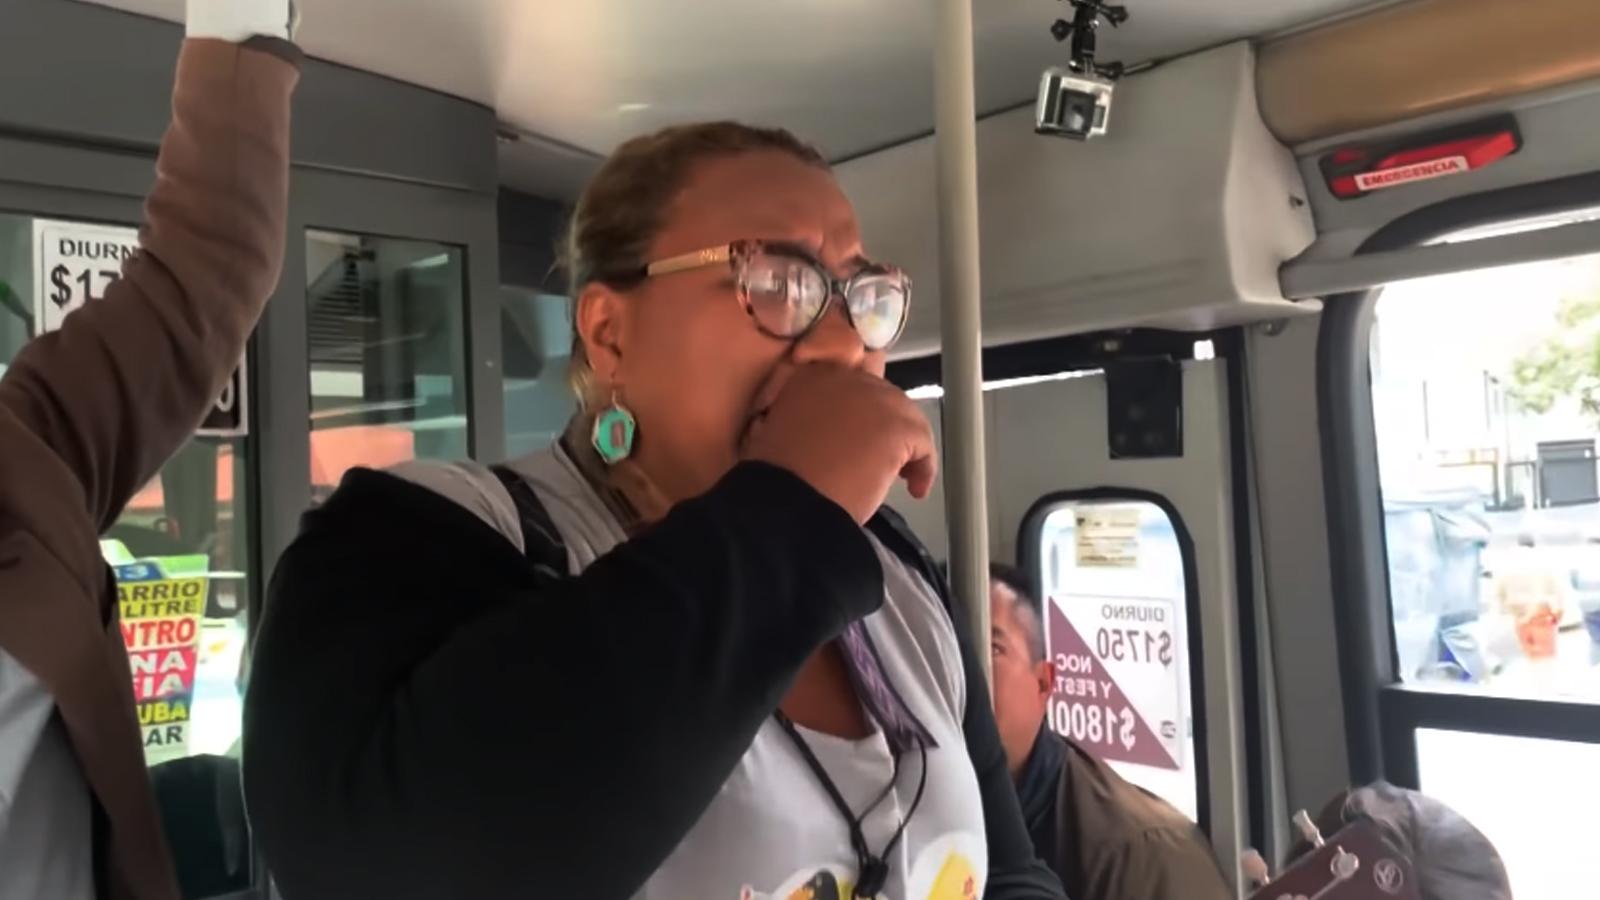 La conmovedora sorpresa a una venezolana que se subió a cantar en un bus de Bogotá